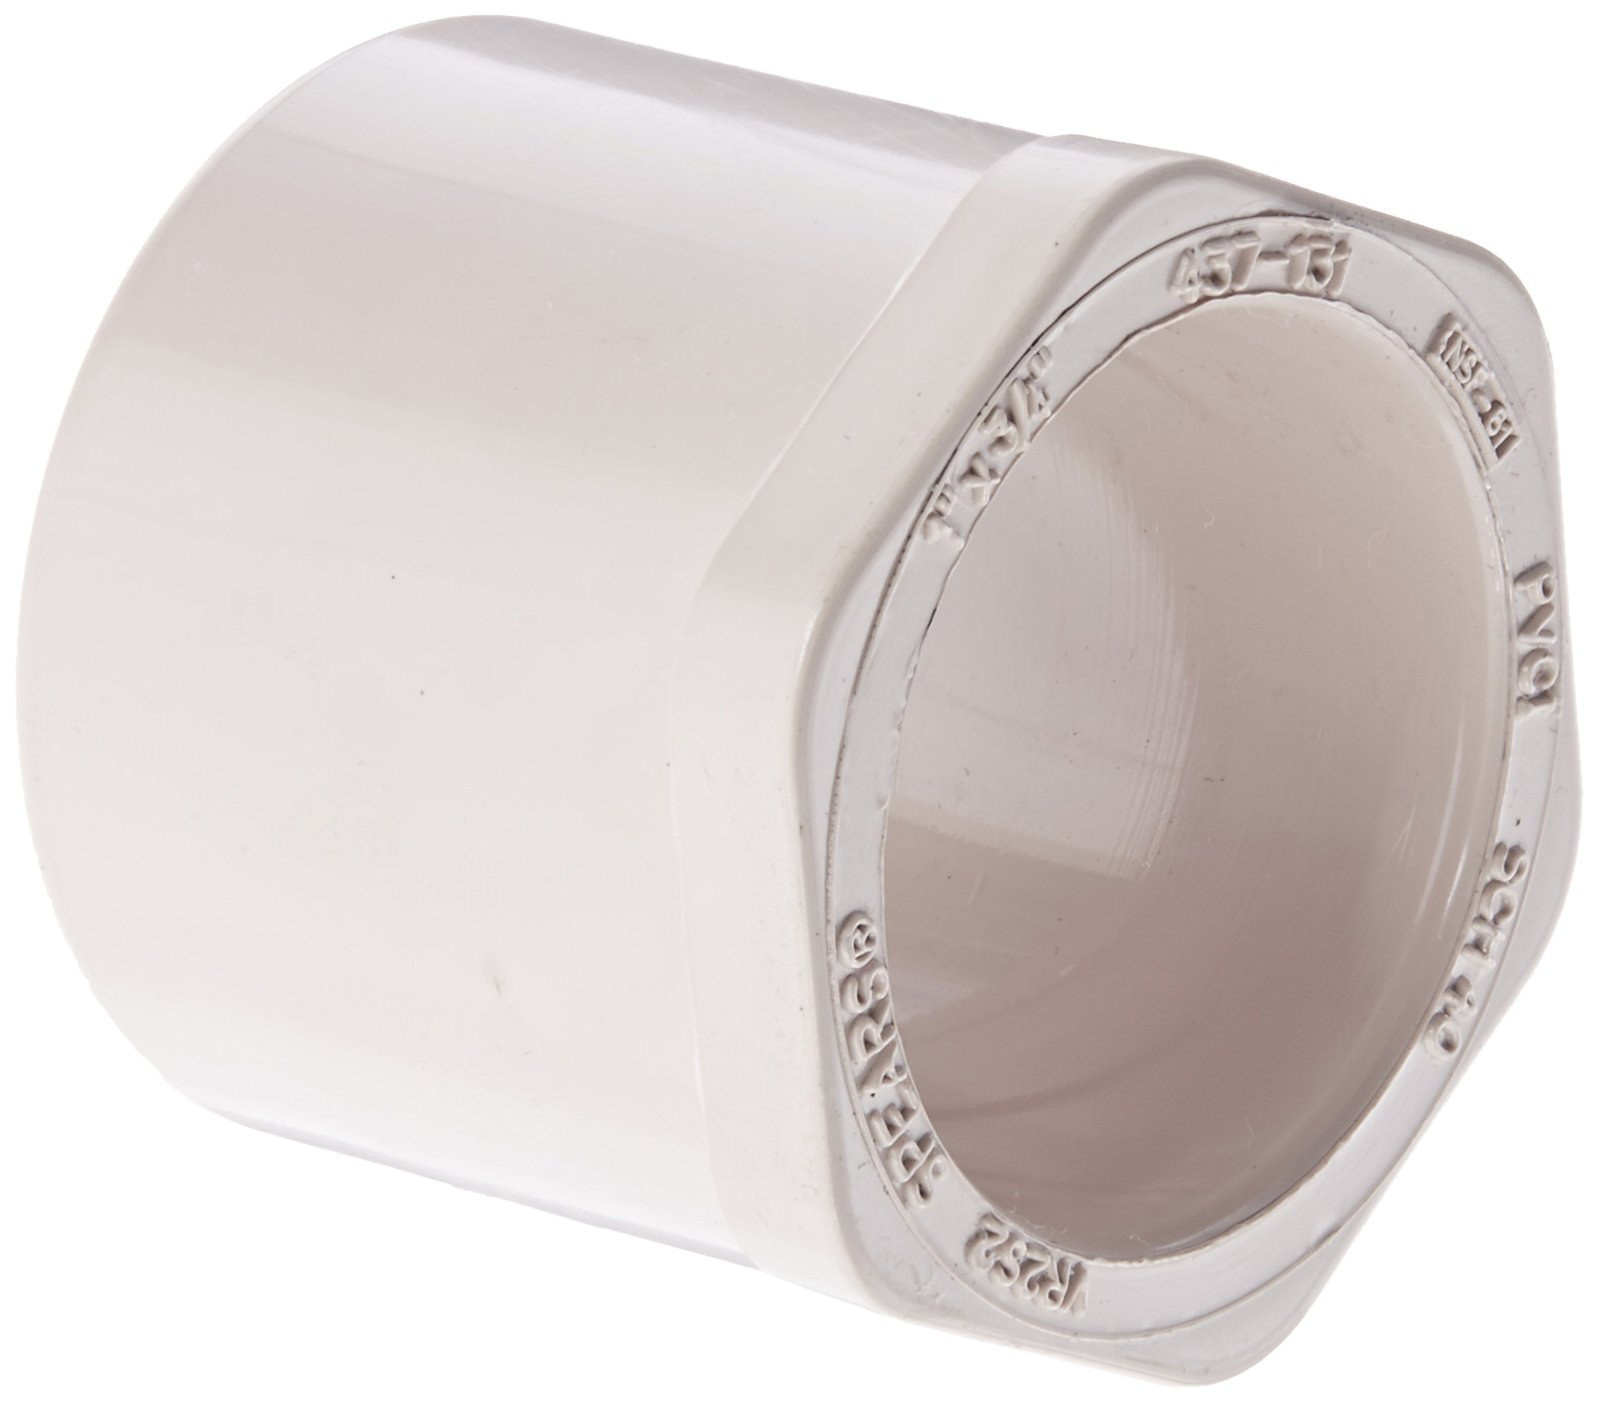 "Spears 437-UV Series PVC Pipe Fitting, UltraViolet Resistant, Bushing, Schedule 40, 1"" Spigot x 3/4"" Socket"